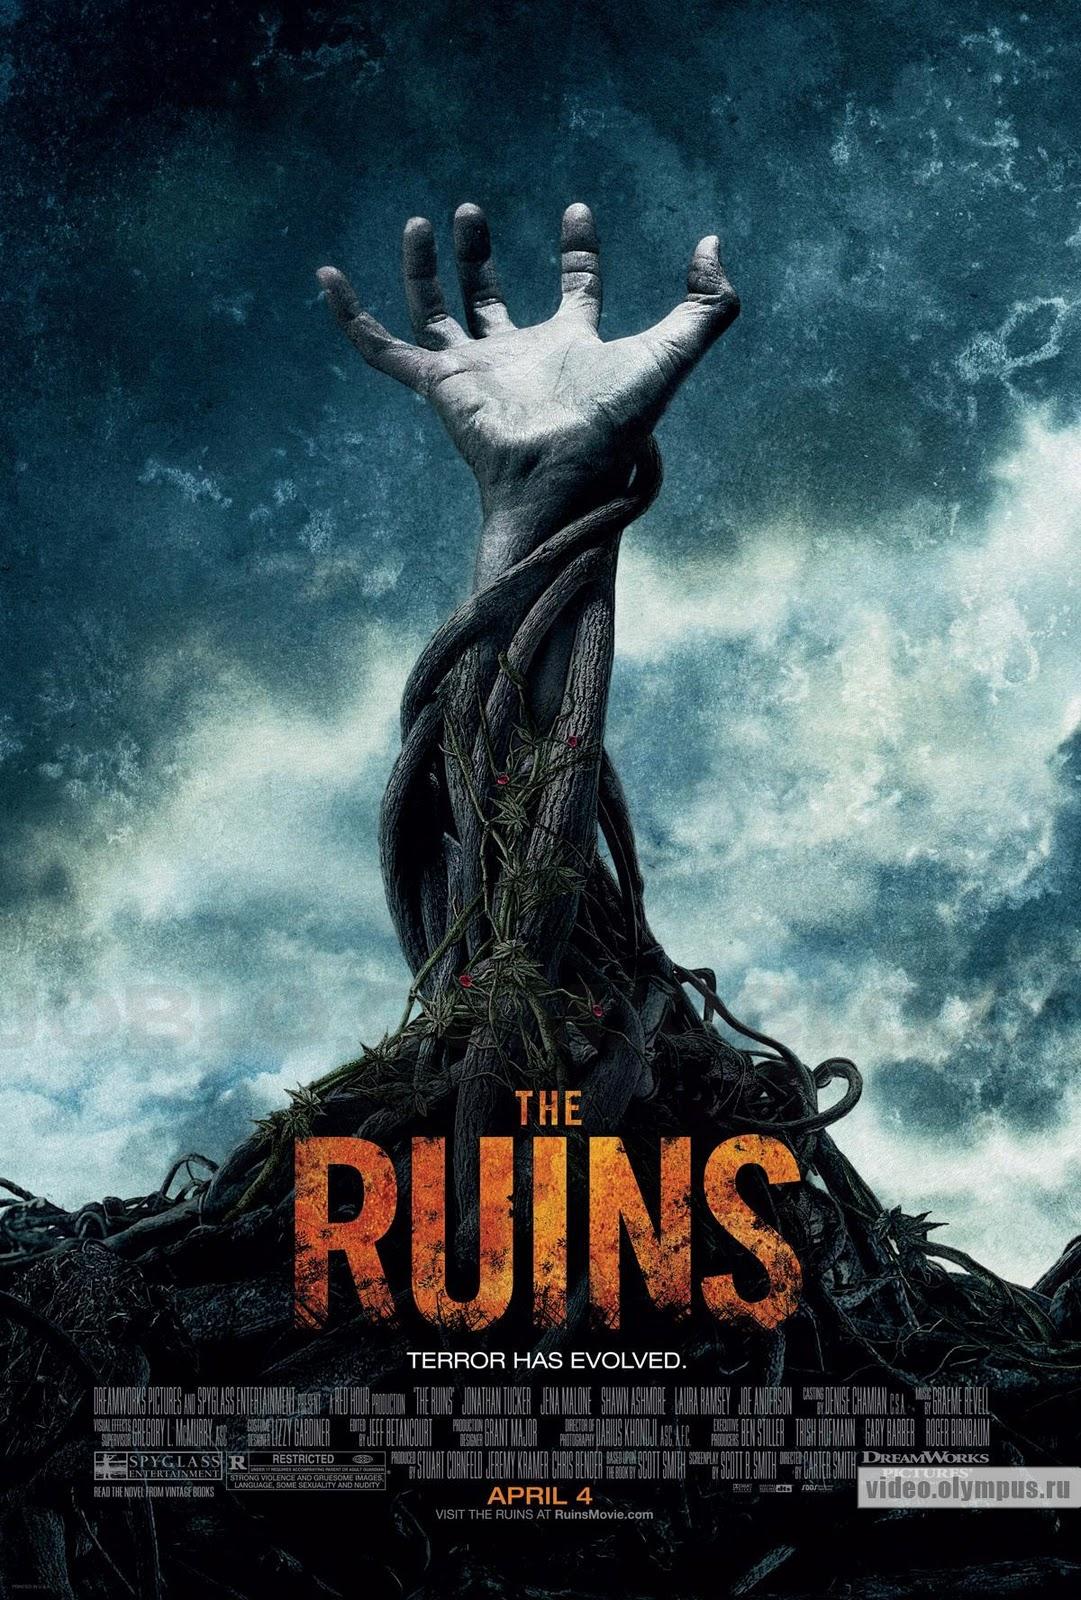 http://3.bp.blogspot.com/-SEq32FGB1oU/Tvb2n9TqJ-I/AAAAAAAAGTM/Oyv6xCBLCWE/s1600/the-ruins-movie-poster1.jpg